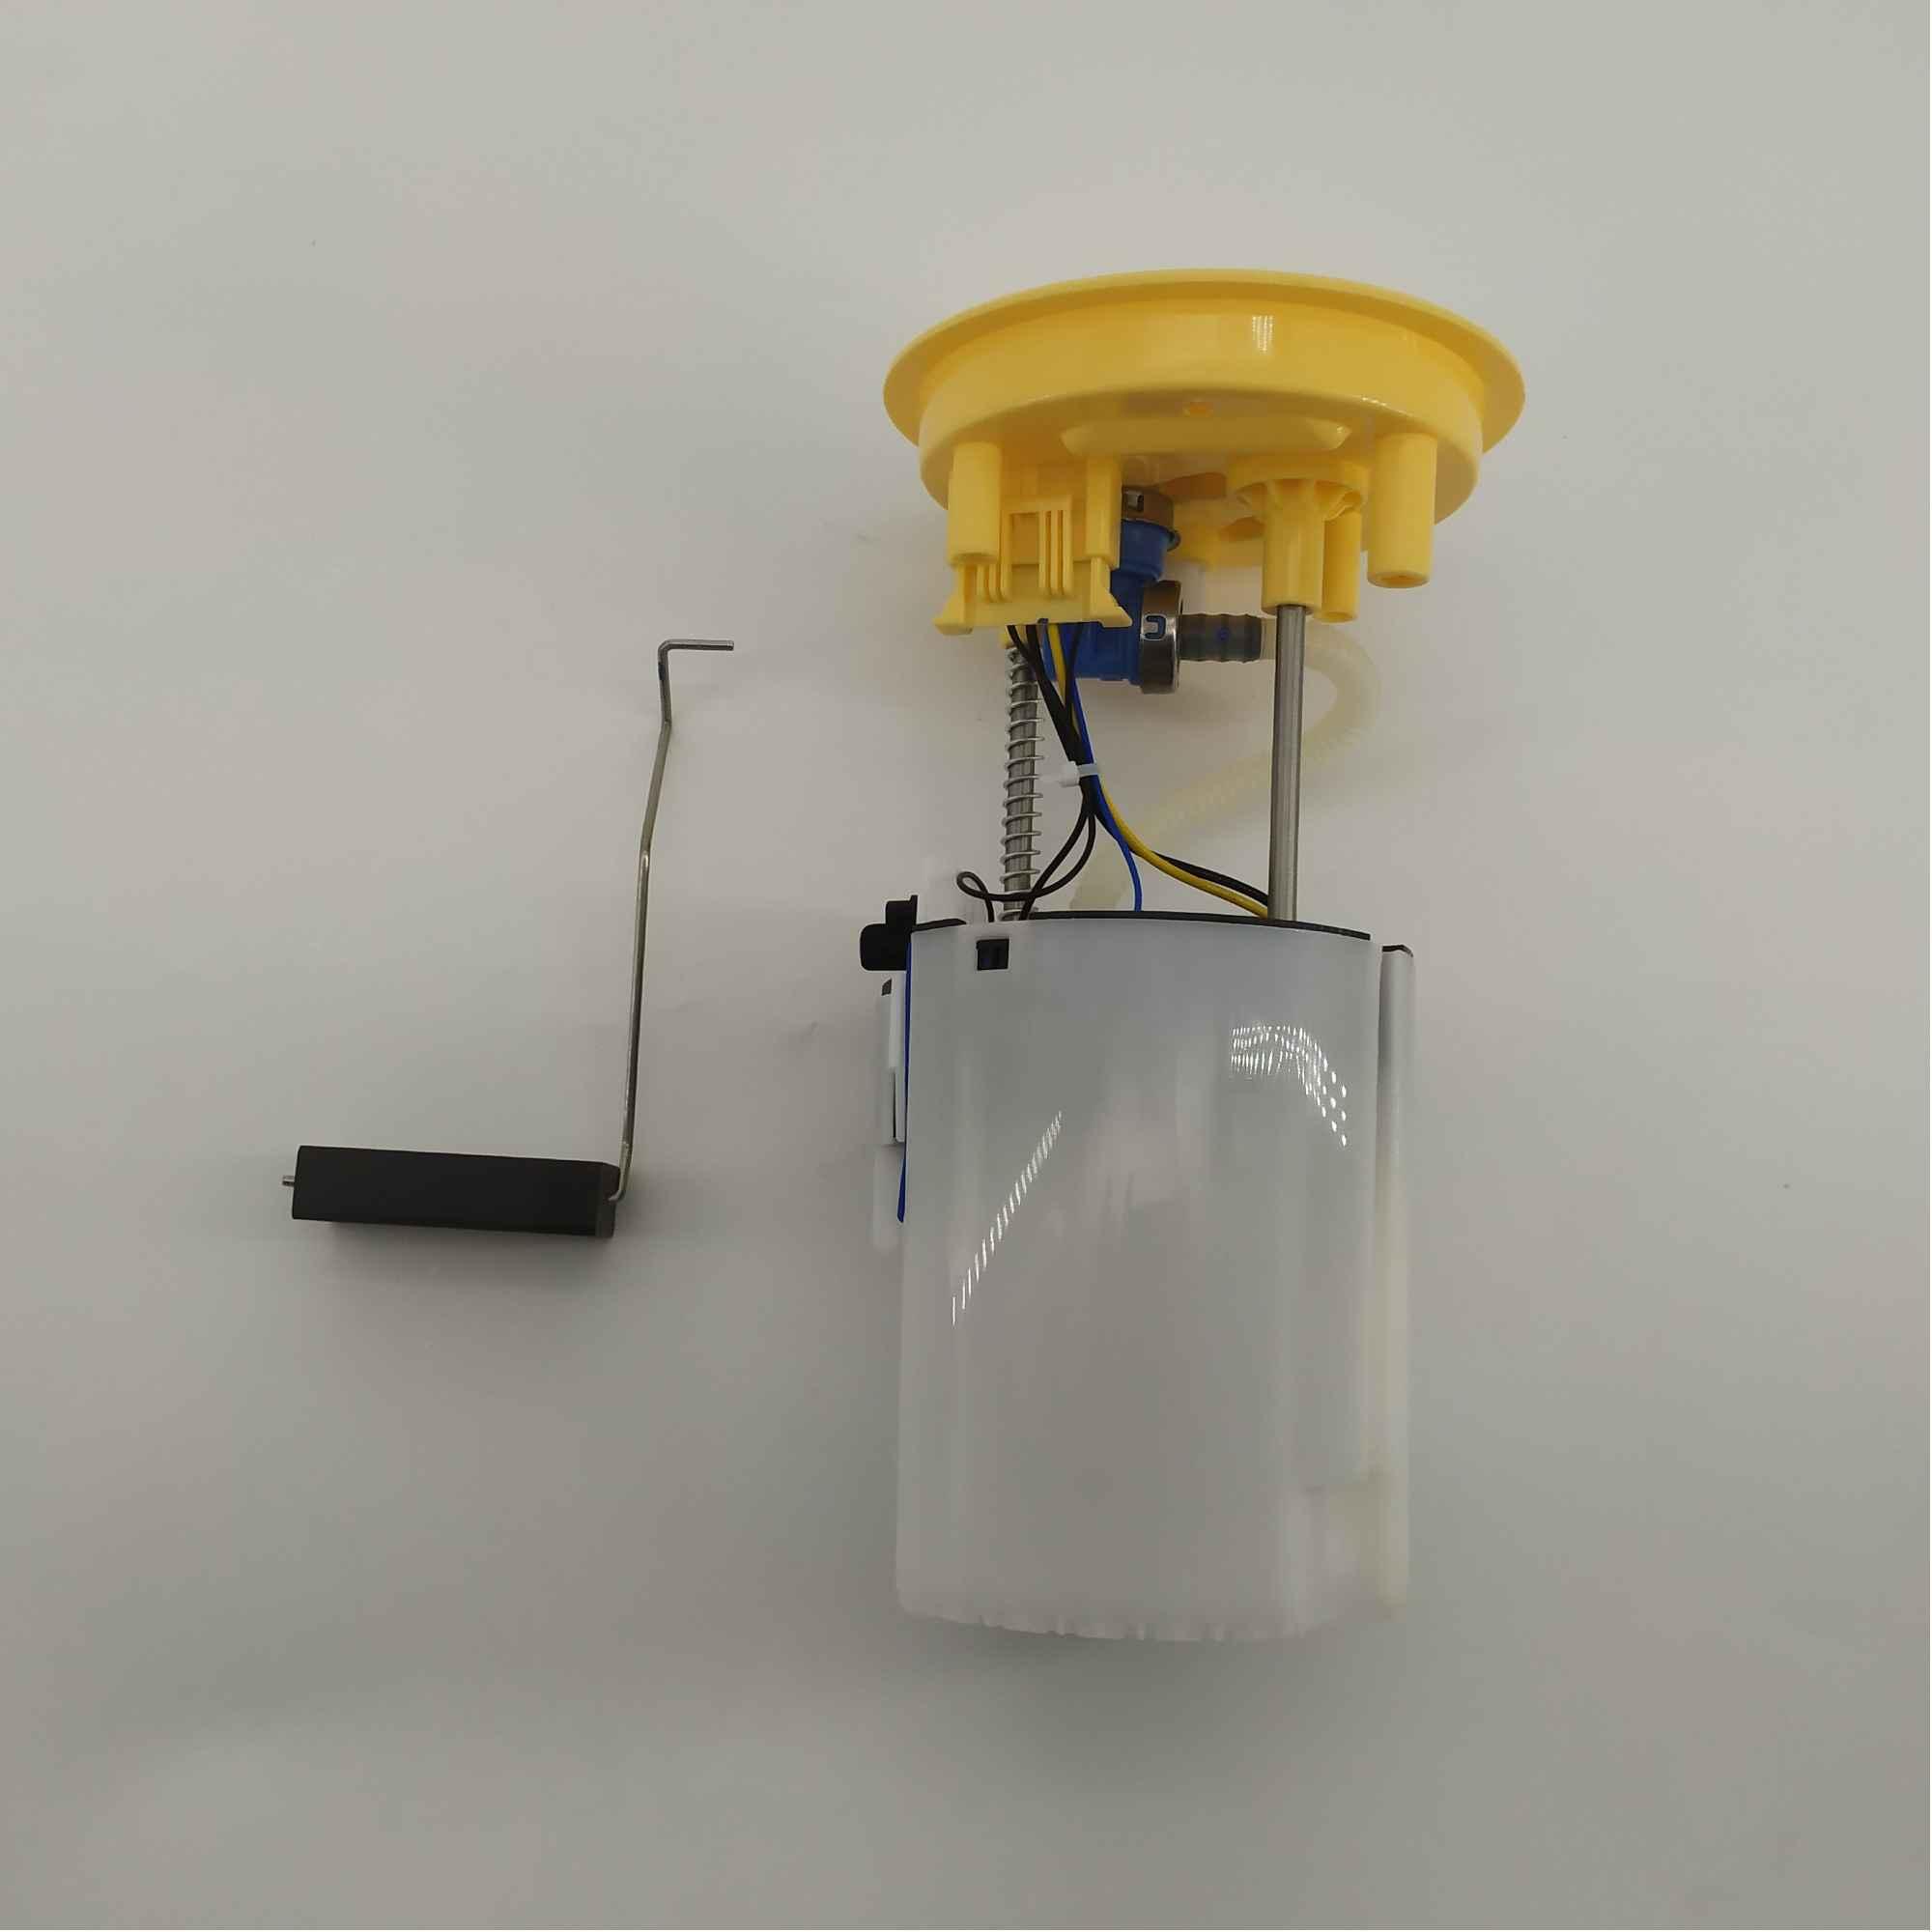 AG9N-9H307-CE conjunto completo de bomba de combustible de alta calidad para XC60 T5 2,02013-2015 S80 II (AS) T5 2010 para Ford Mondeo 2,0 T MK